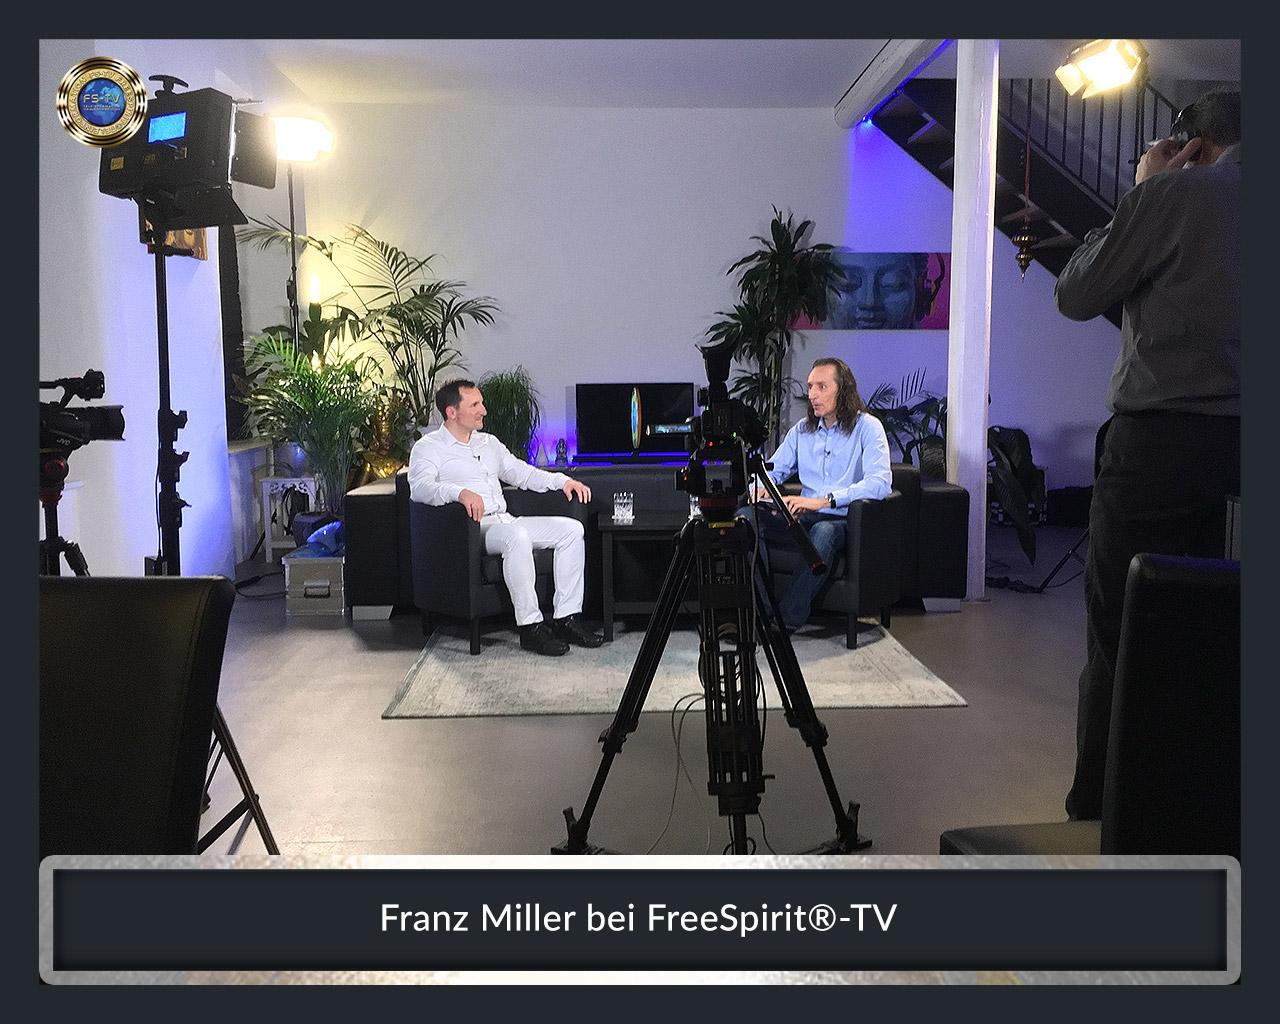 FS-TV-Bildergallerie-Franz-Miller-5